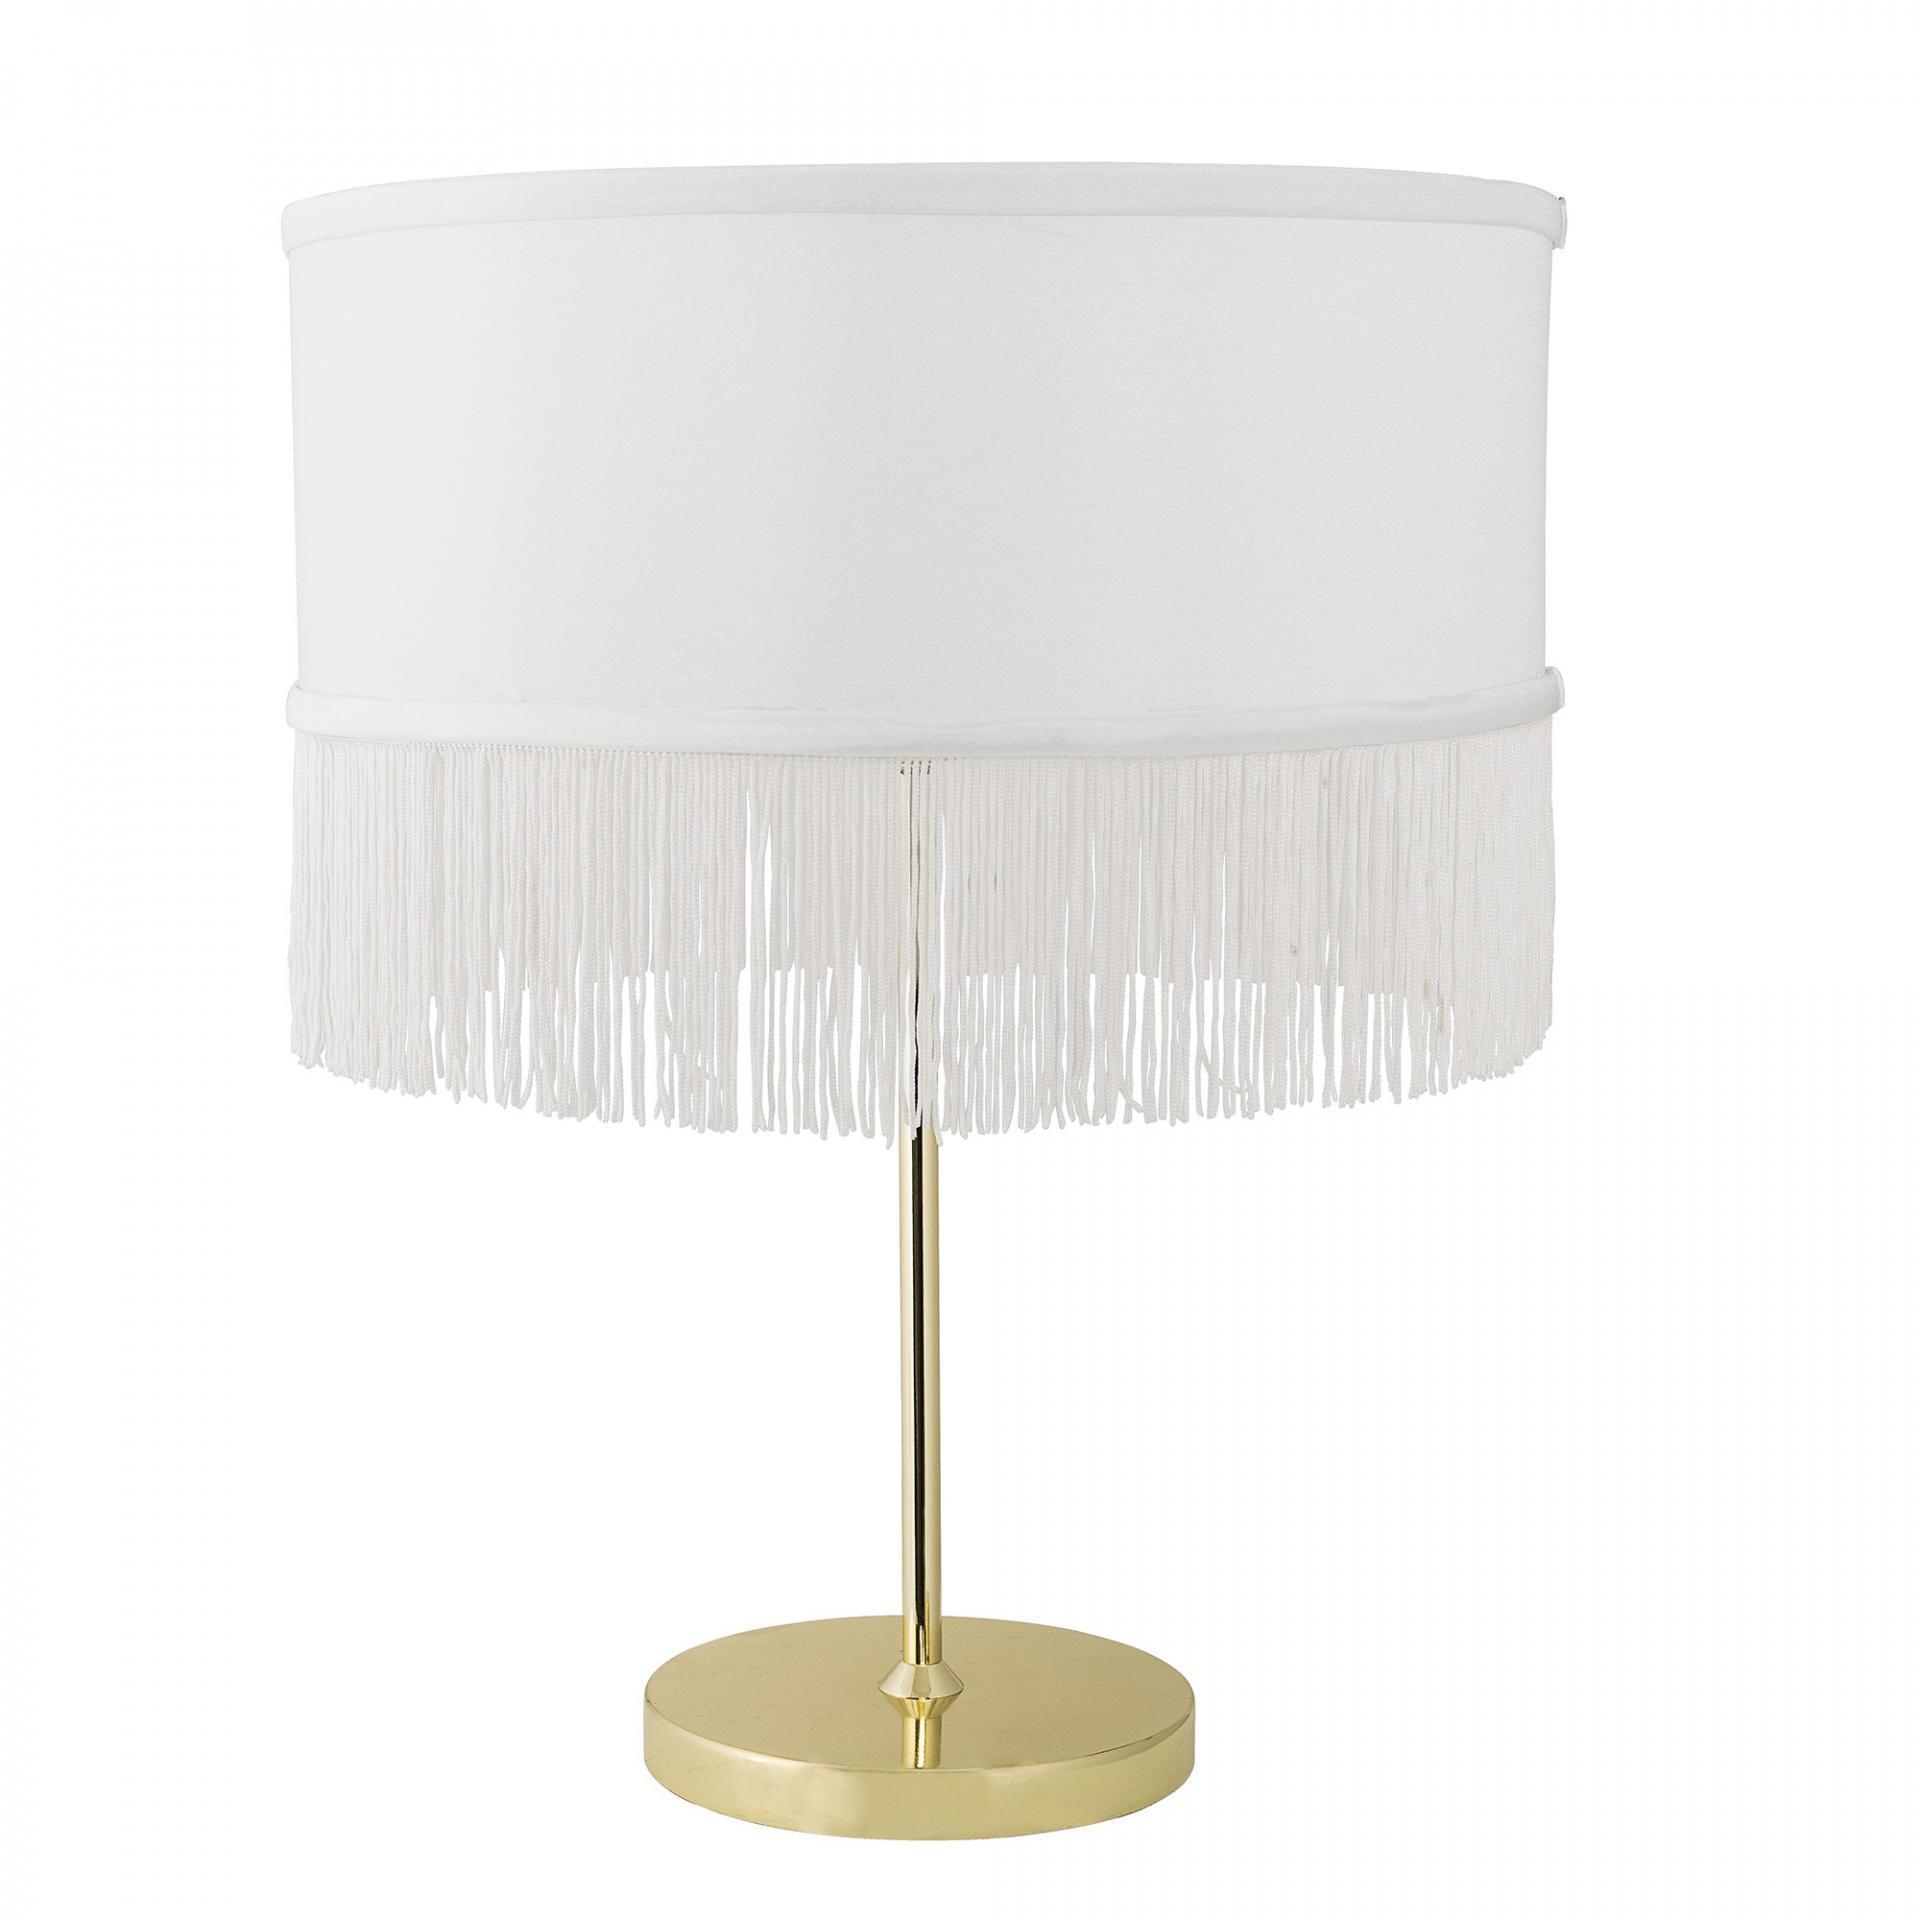 Bloomingville Stolní lampa Gold Metal, bílá barva, zlatá barva, kov, textil